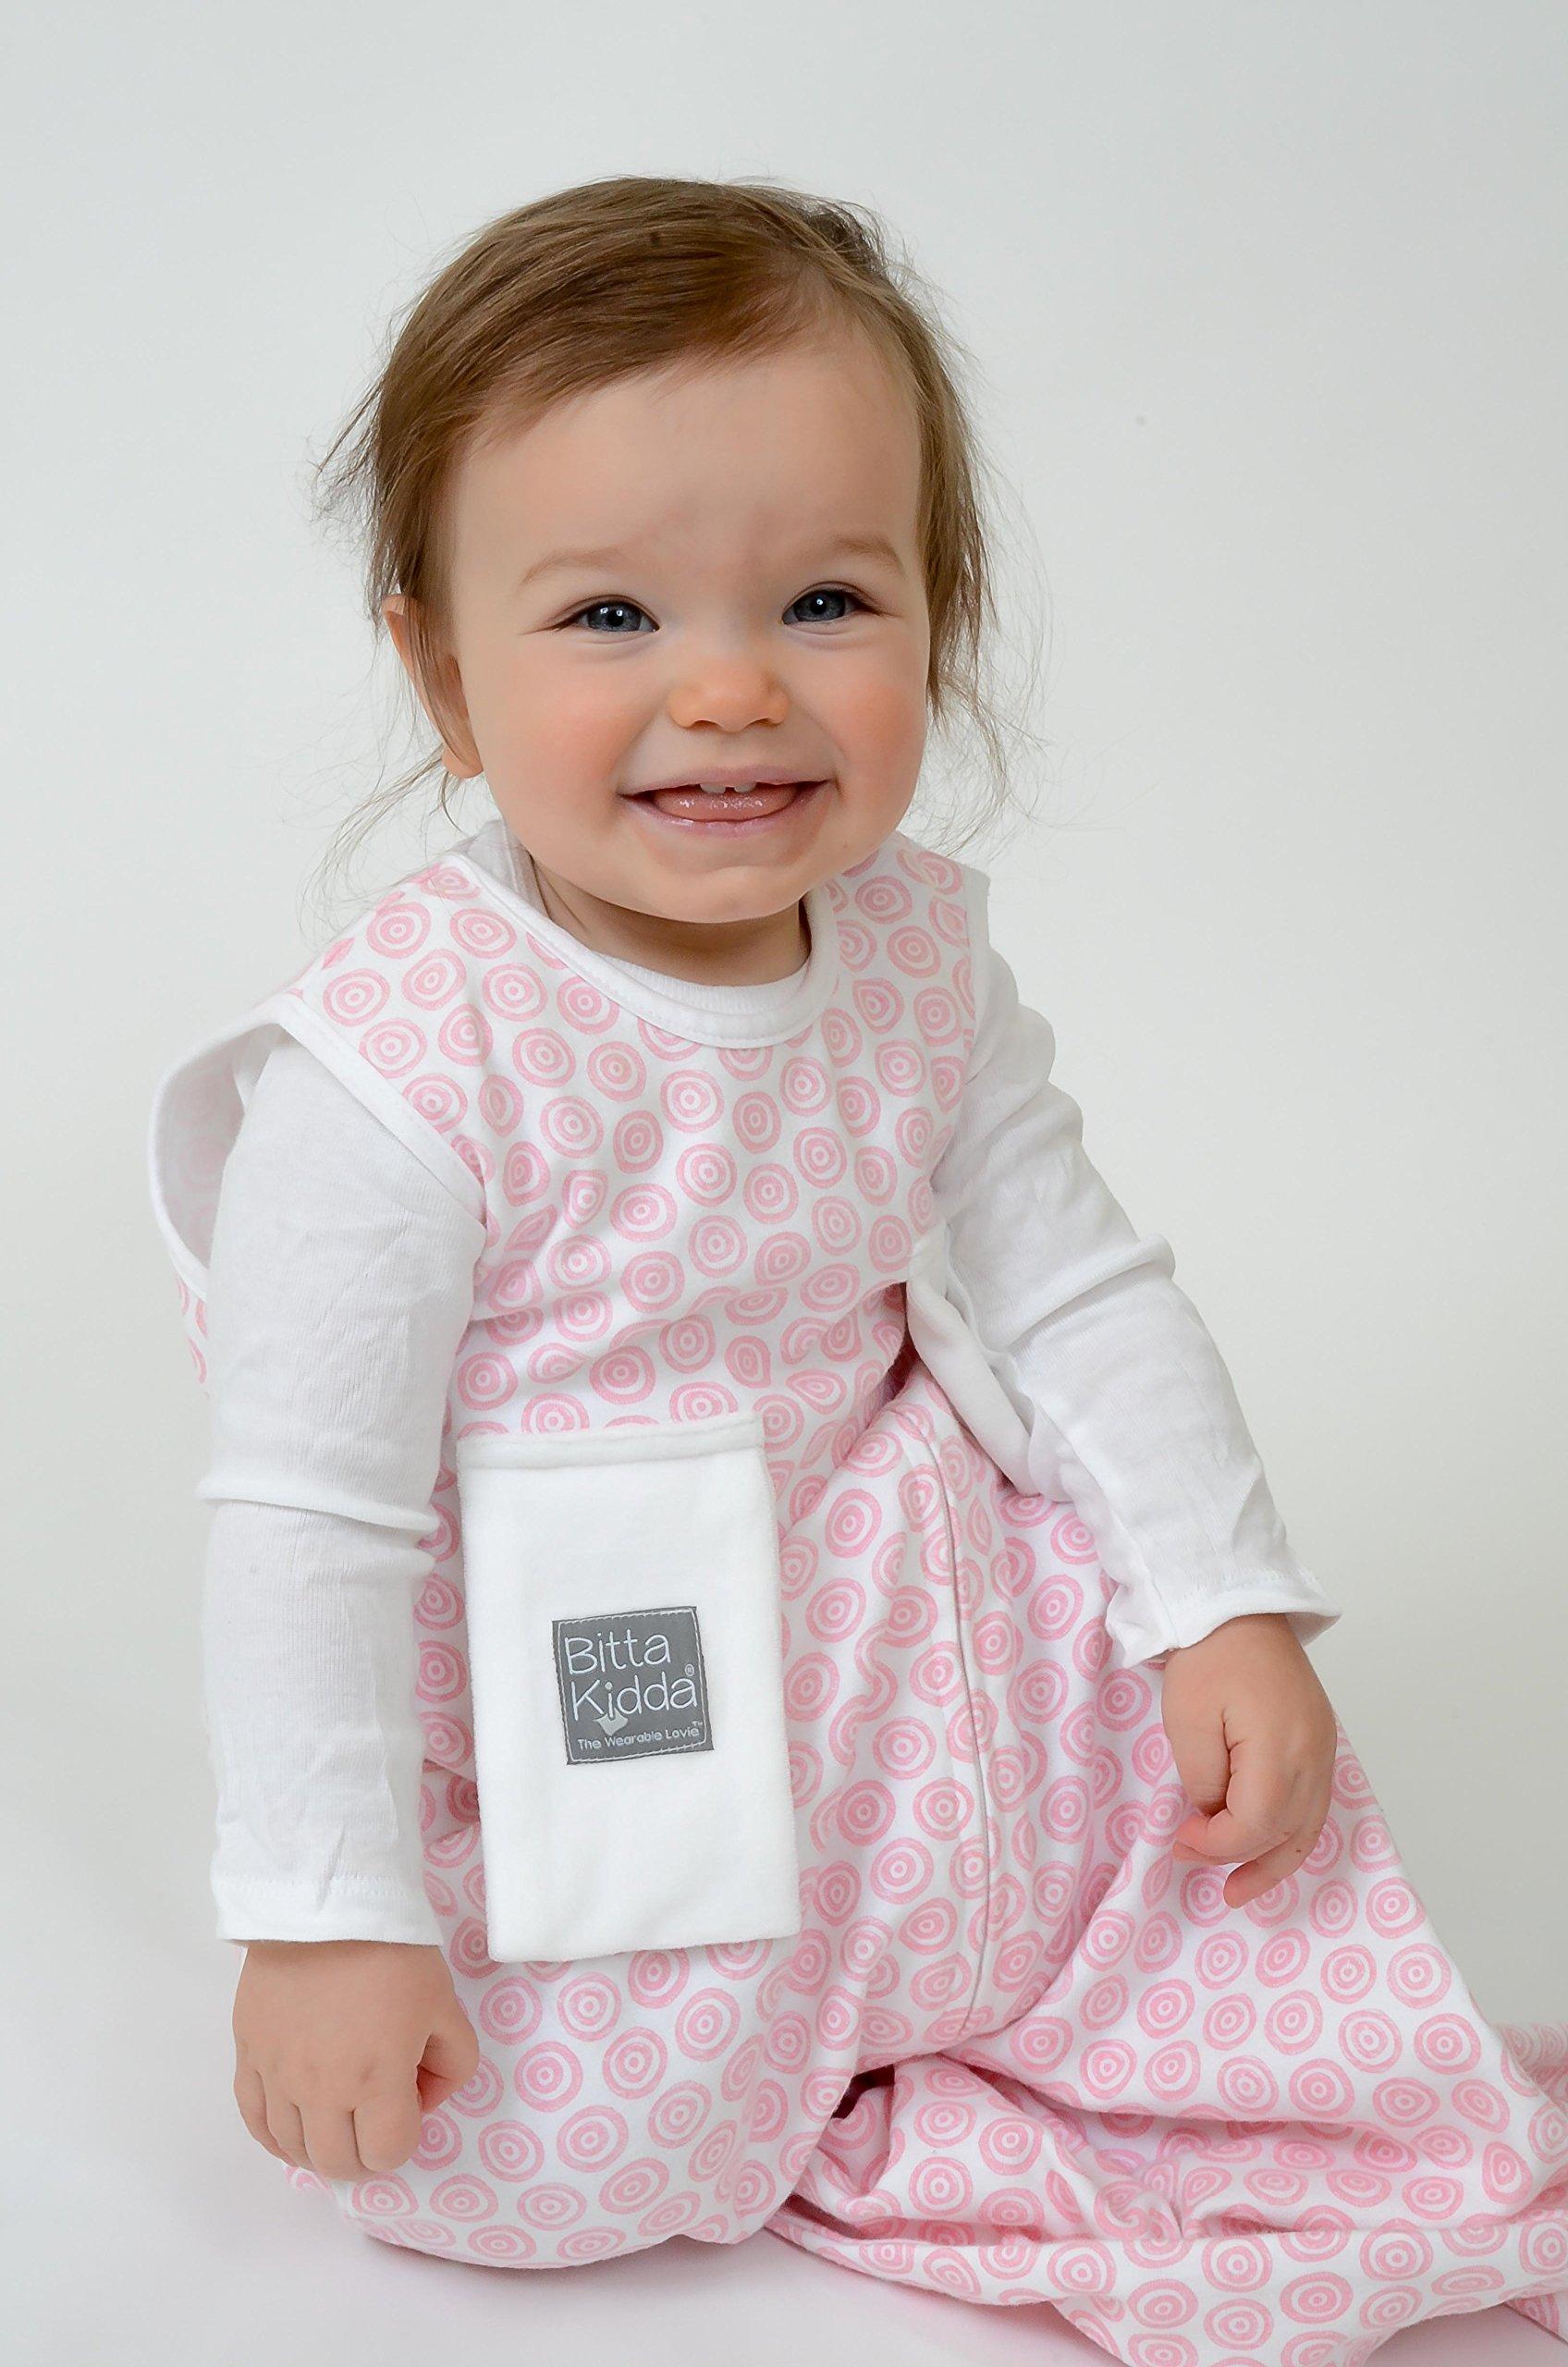 Bitta Kidda Baby Soother Sleeping Bag Wearable Blanket + Lovey - Pink Circles 9M